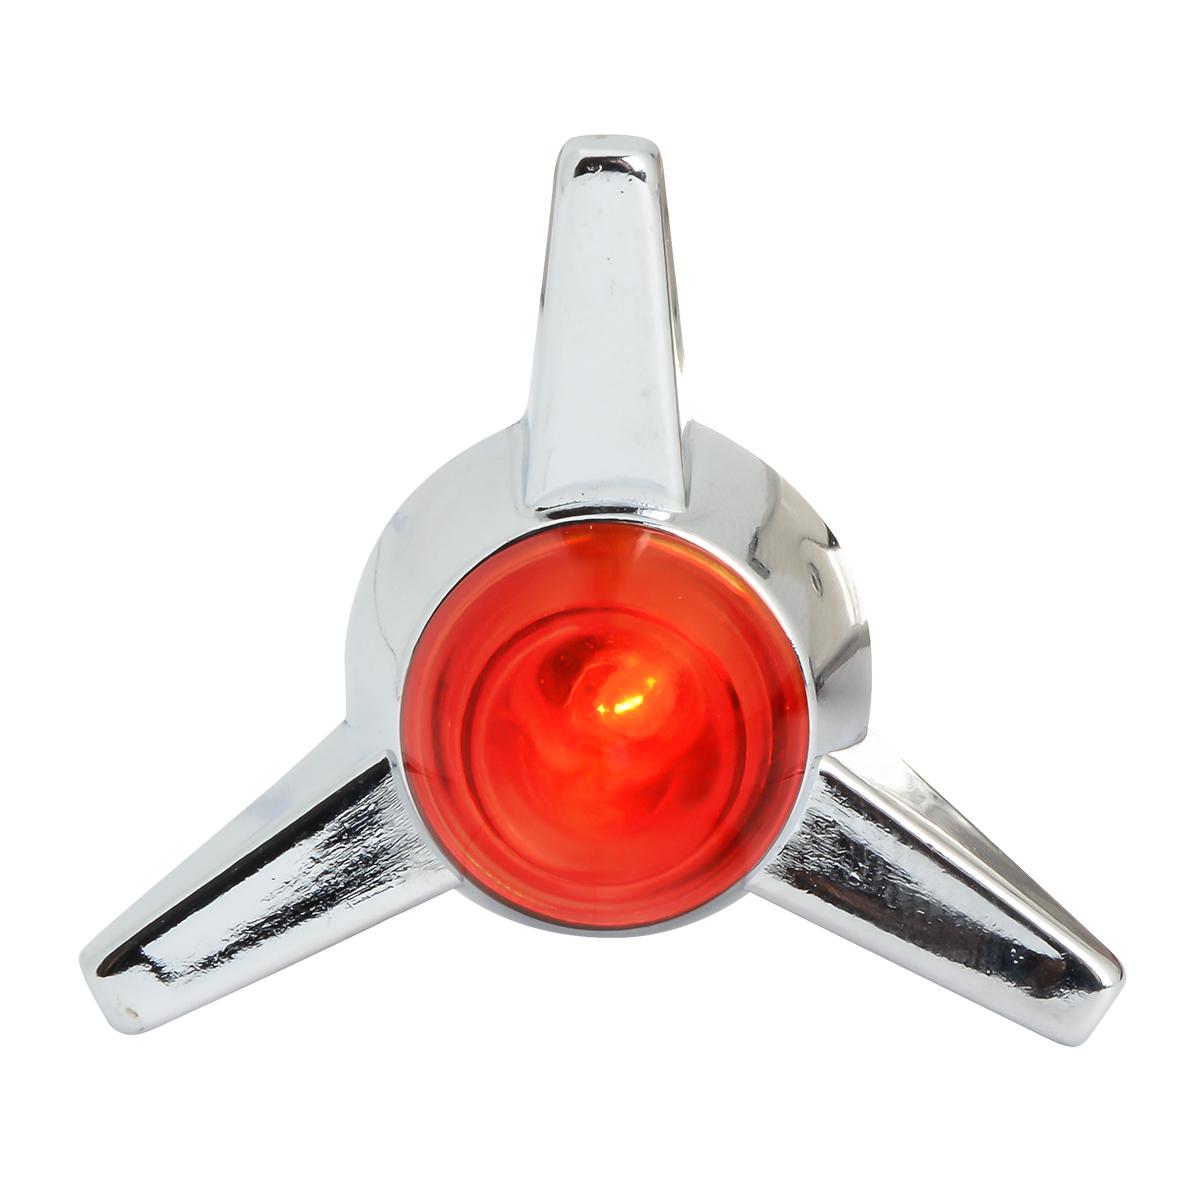 Spinner Style Lighted Fastener Set - Red